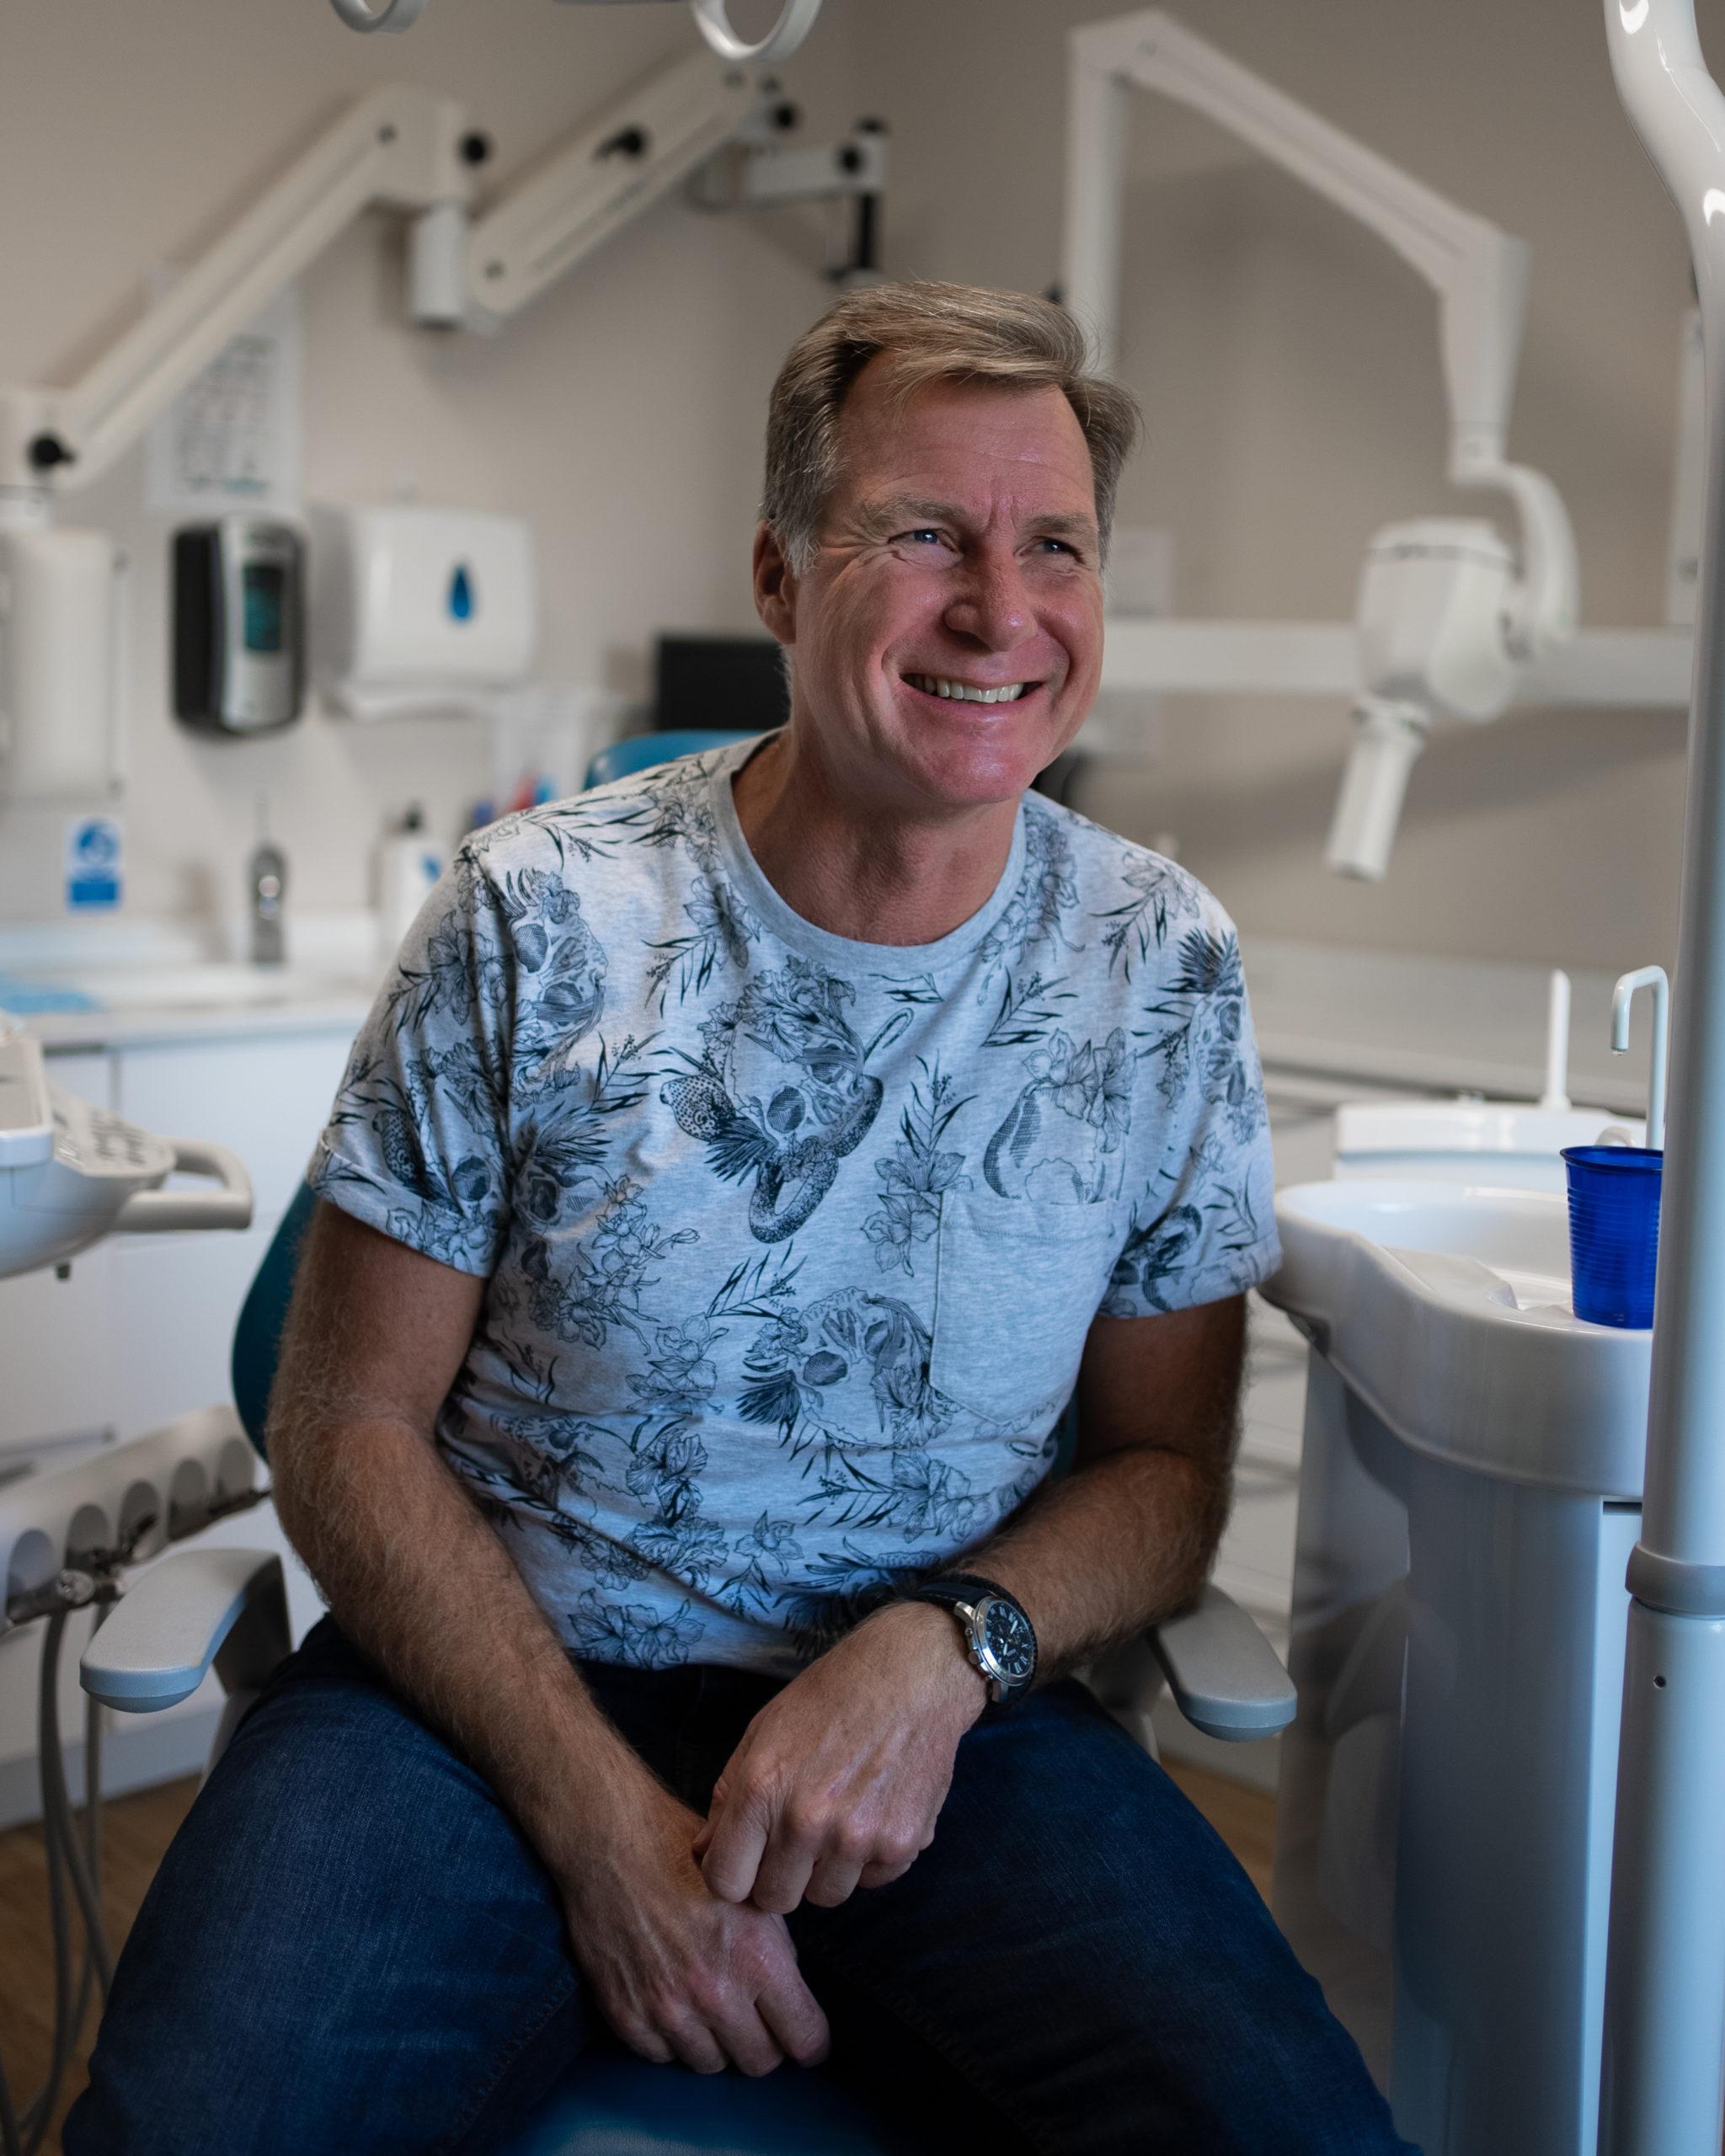 https://pennhilldental.co.uk/wp-content/uploads/2020/12/Dental-Photos-Cooled-off-46-scaled.jpg